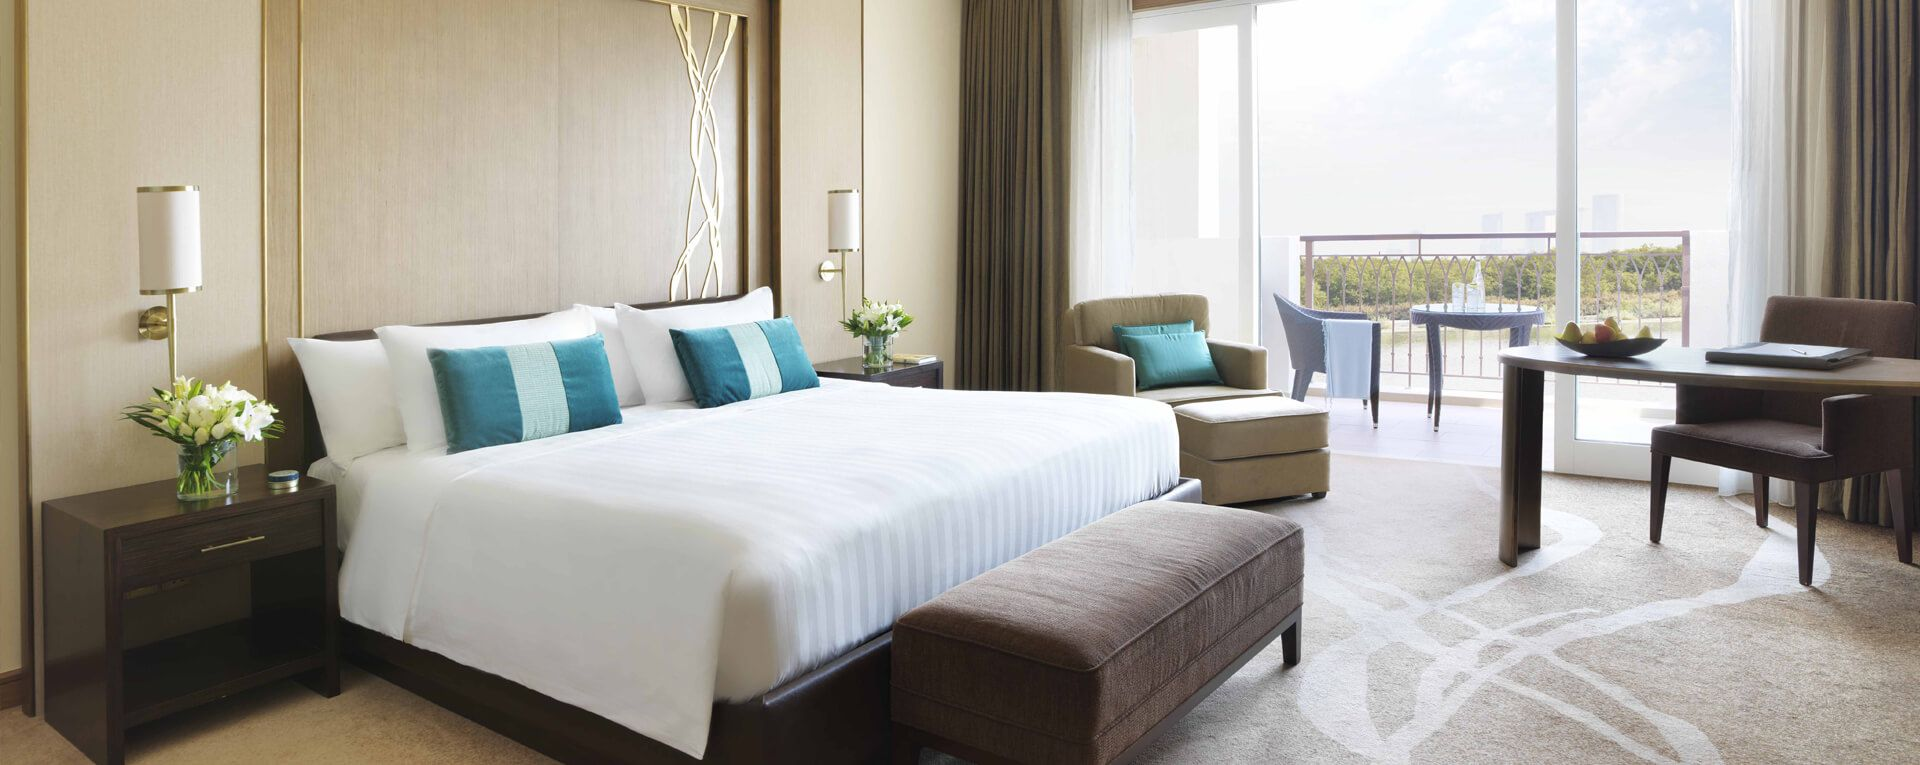 Eastern Mangroves Hotel & Spa